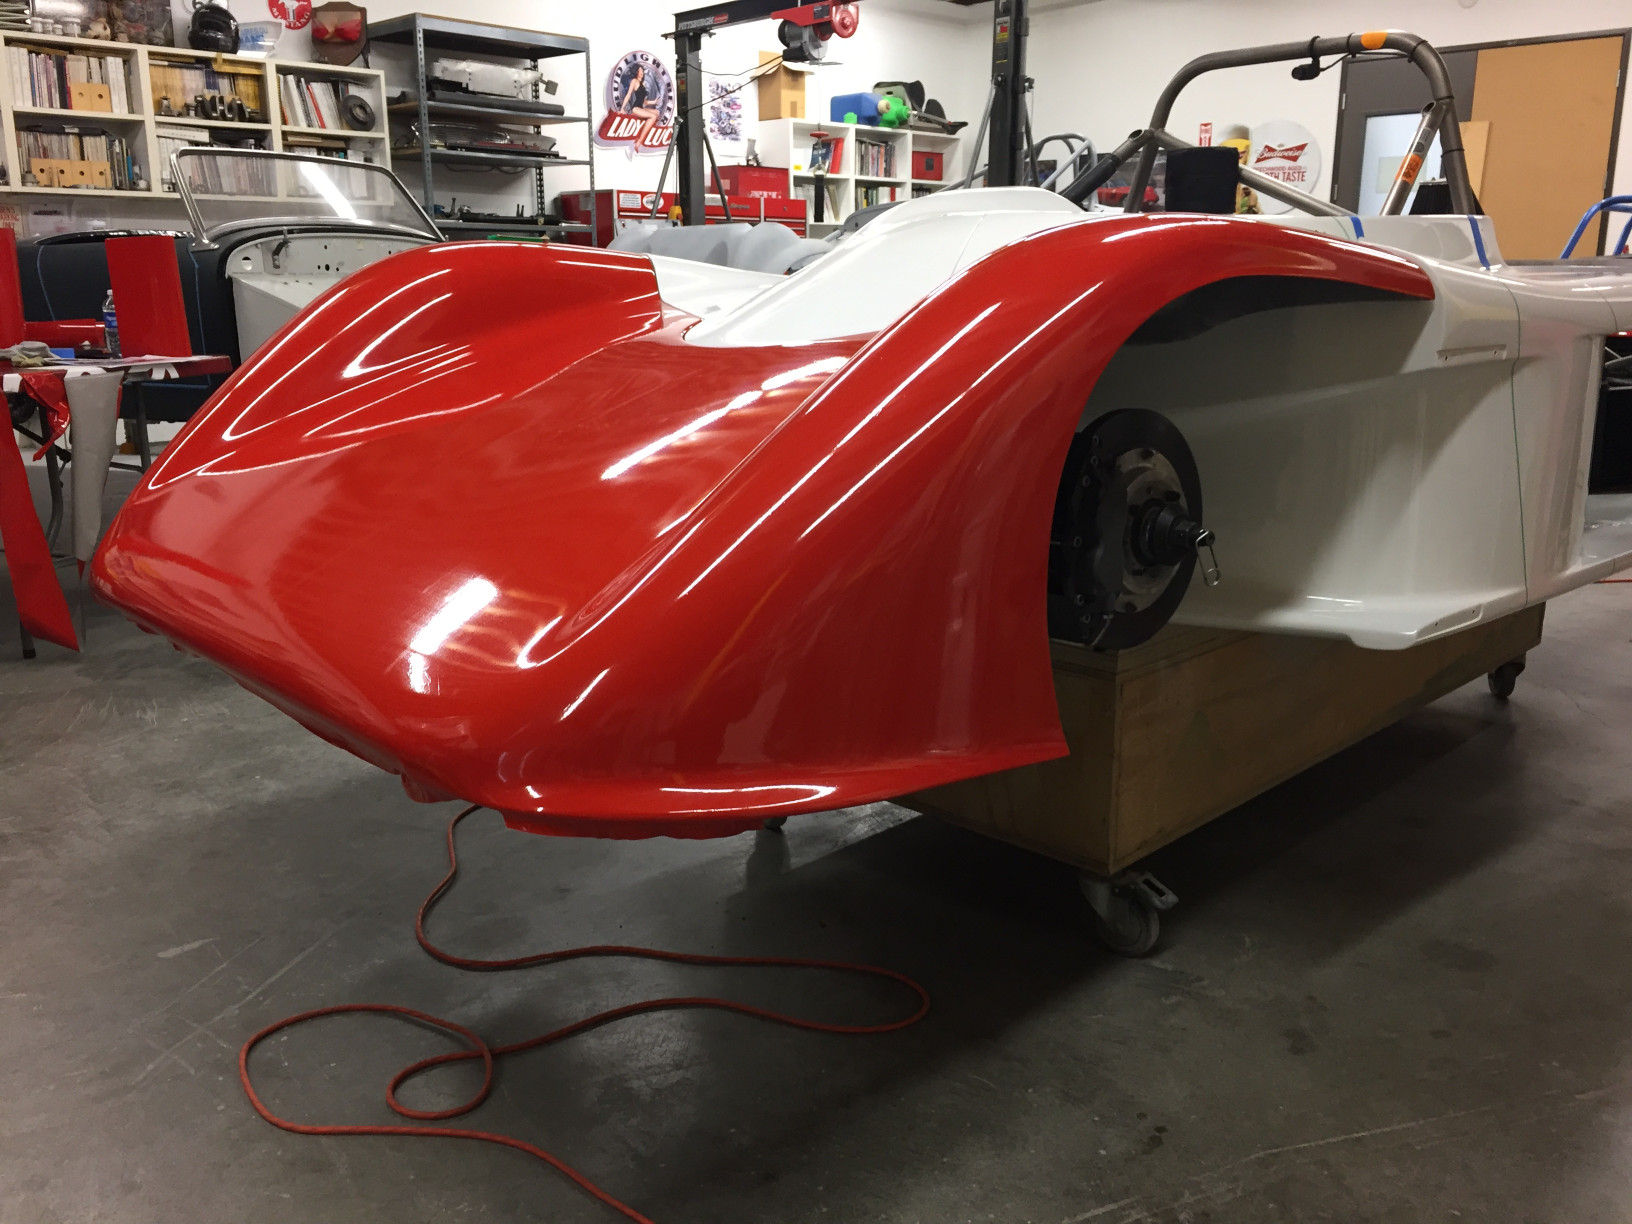 Custom Car Wraps Designed and Installed in Fullerton!